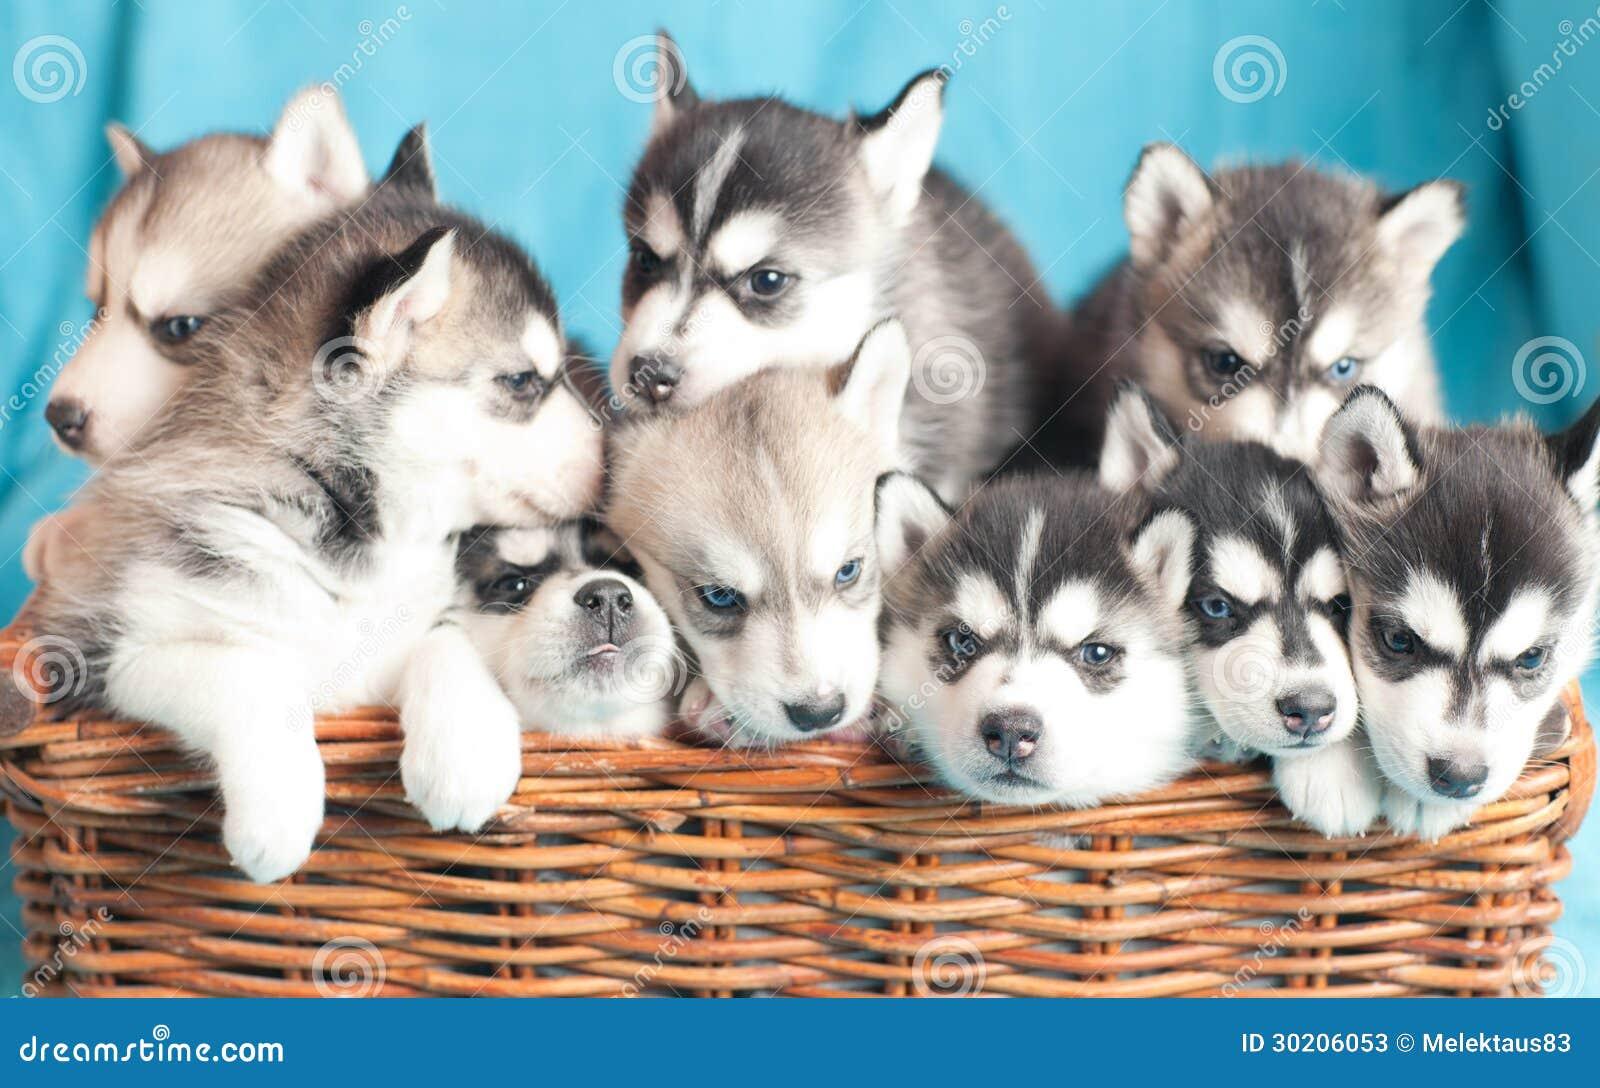 Nine husky puppies